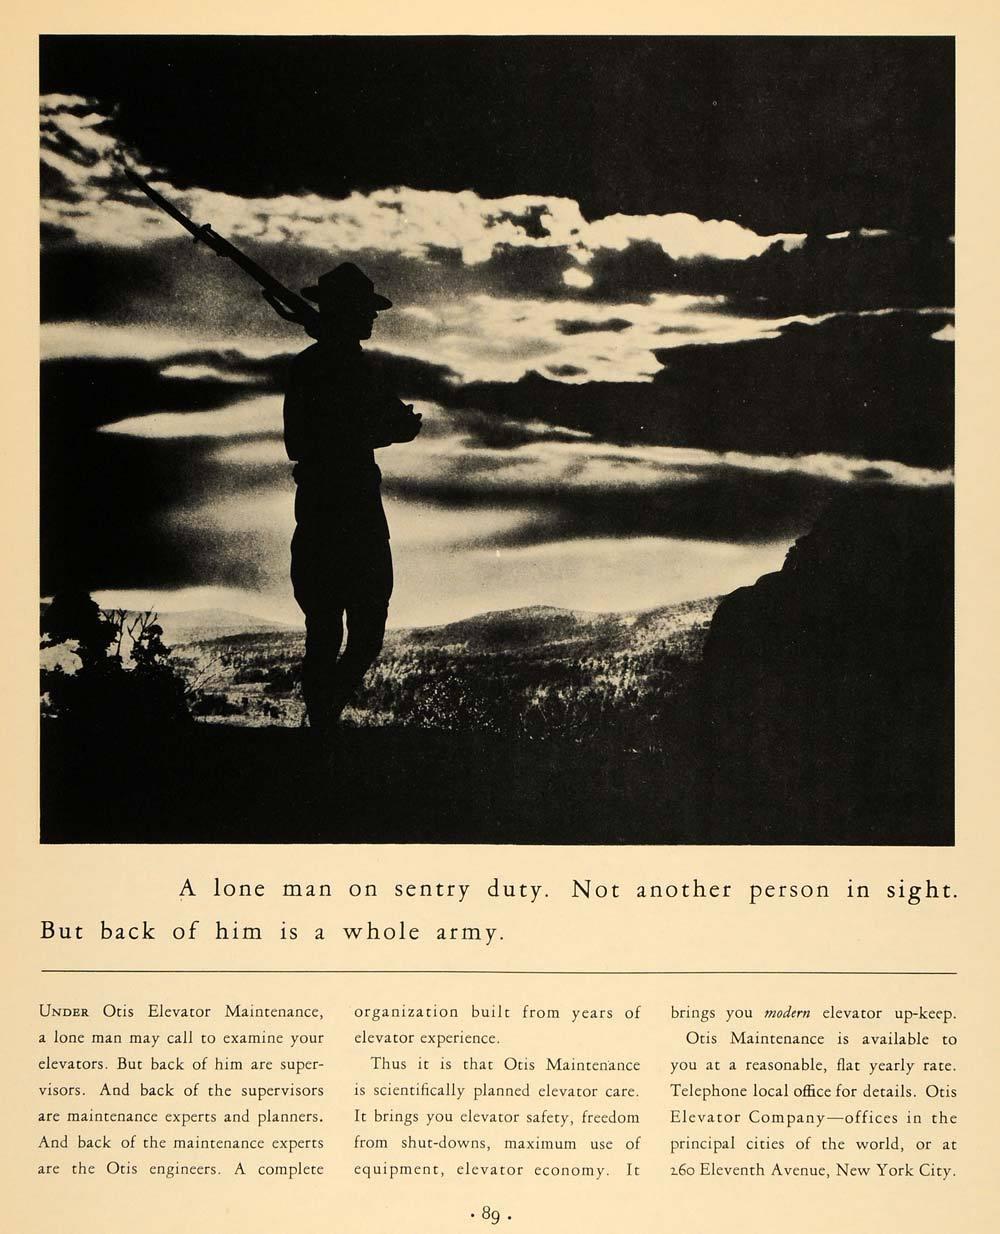 1933 Ad Otis Elevators Sentry Army Sunset Gun Soldier